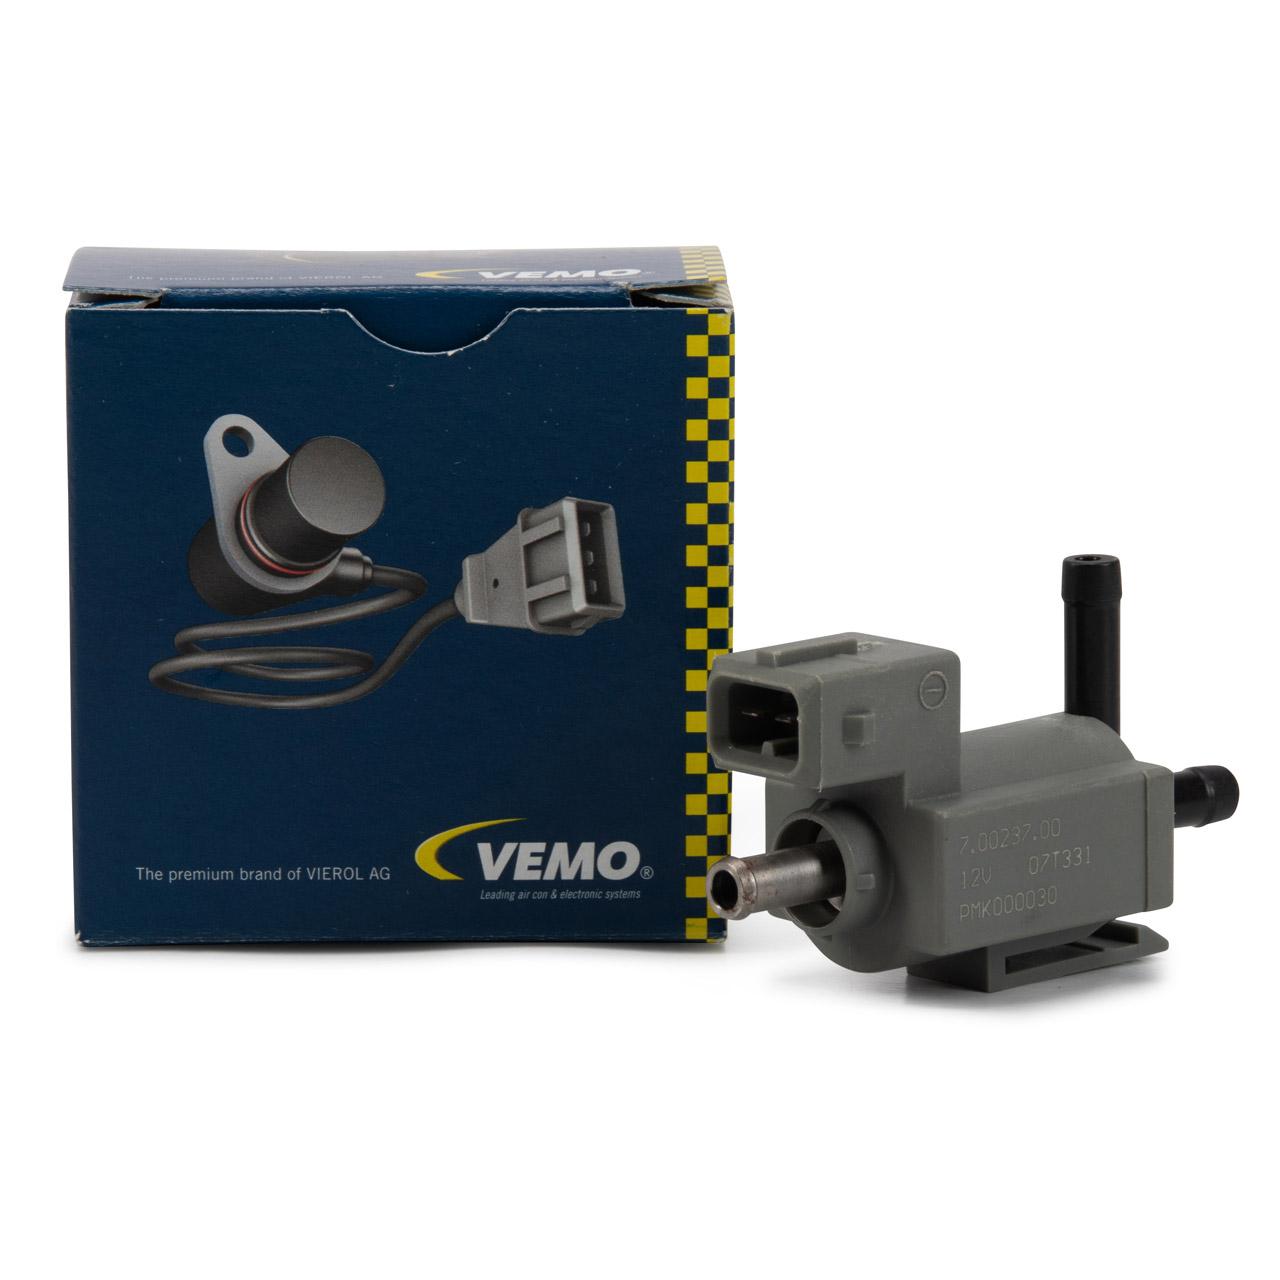 VEMO Ladedruckregelventil PORSCHE 996 3.6 Turbo GT2 GT3 Cayenne 9PA Turbo 4.5 Panamera 970